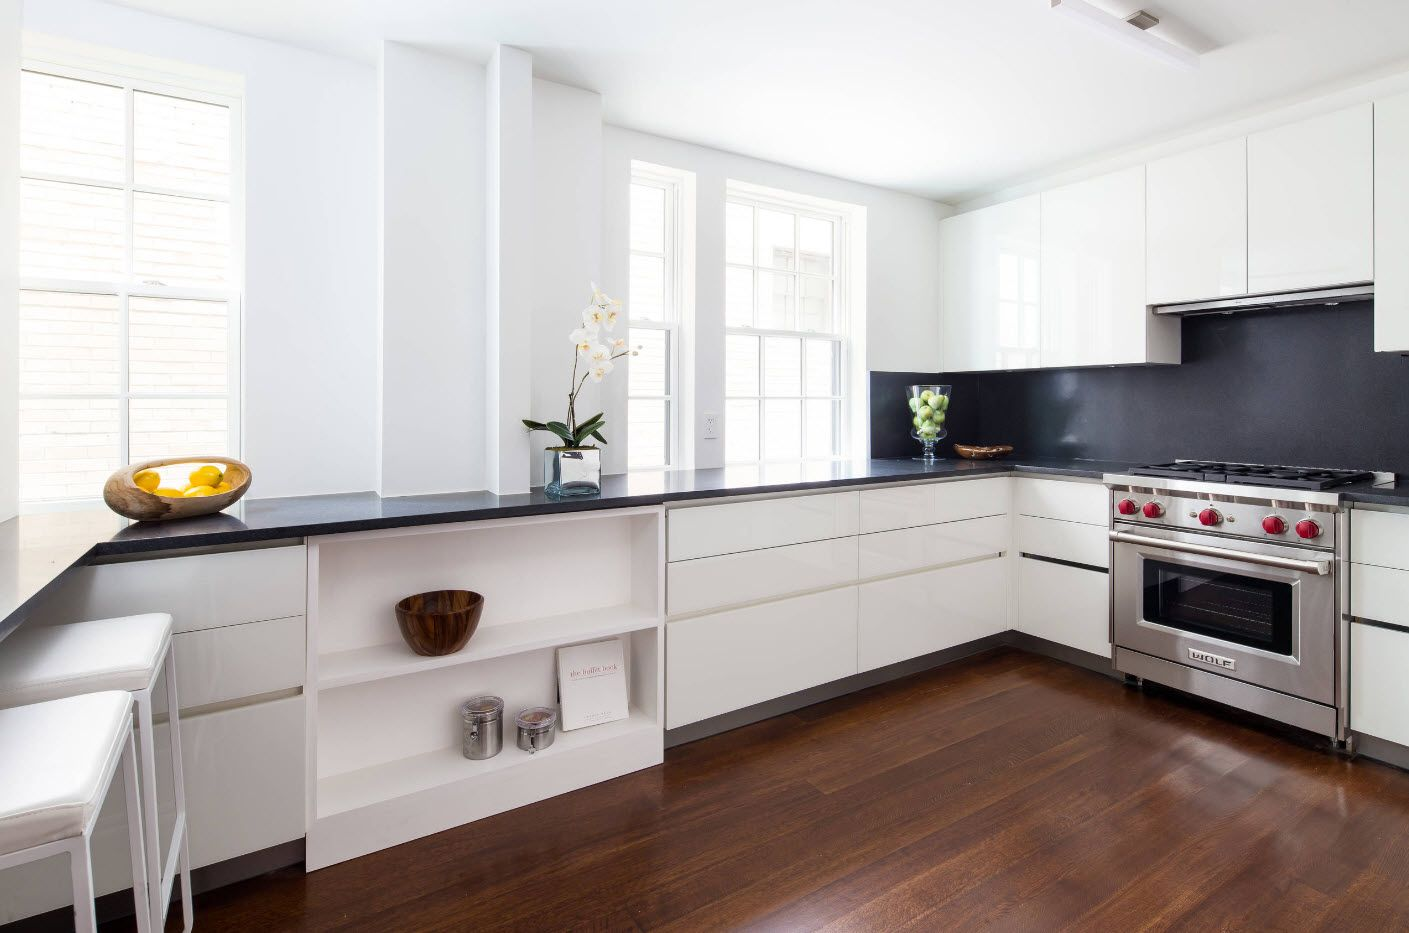 Apartment Interior Design Inspiration Ideas & Trends 2017. White decorative solution for ultramodern kitchen